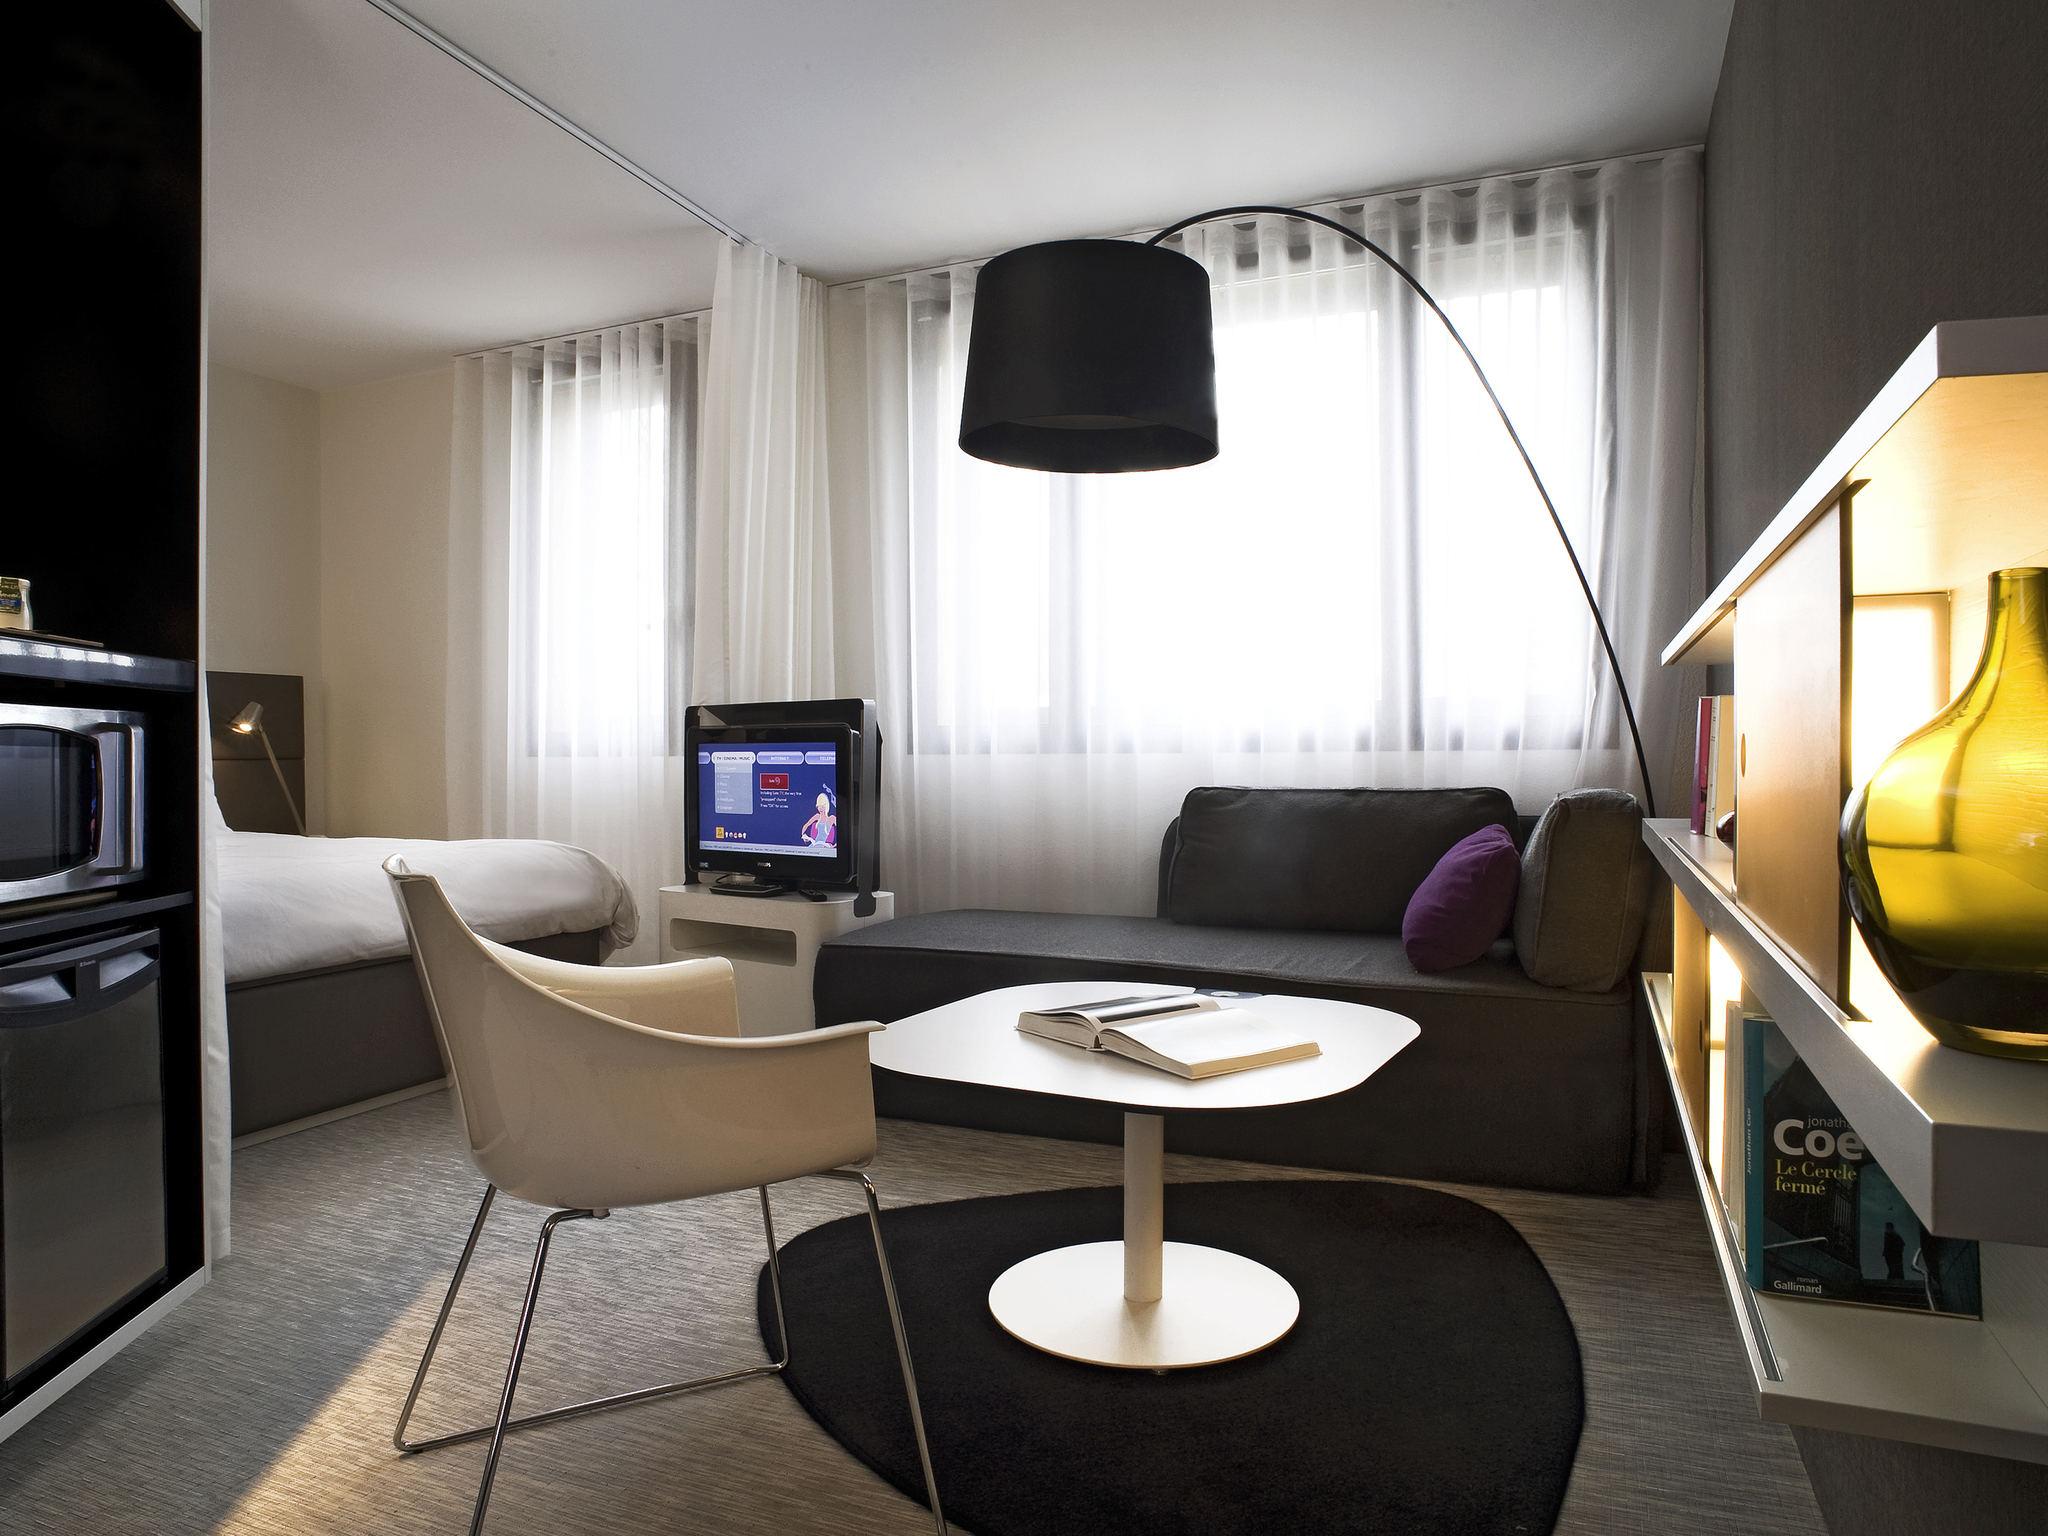 Hotel - Novotel Suites Perpignan Mediterranée